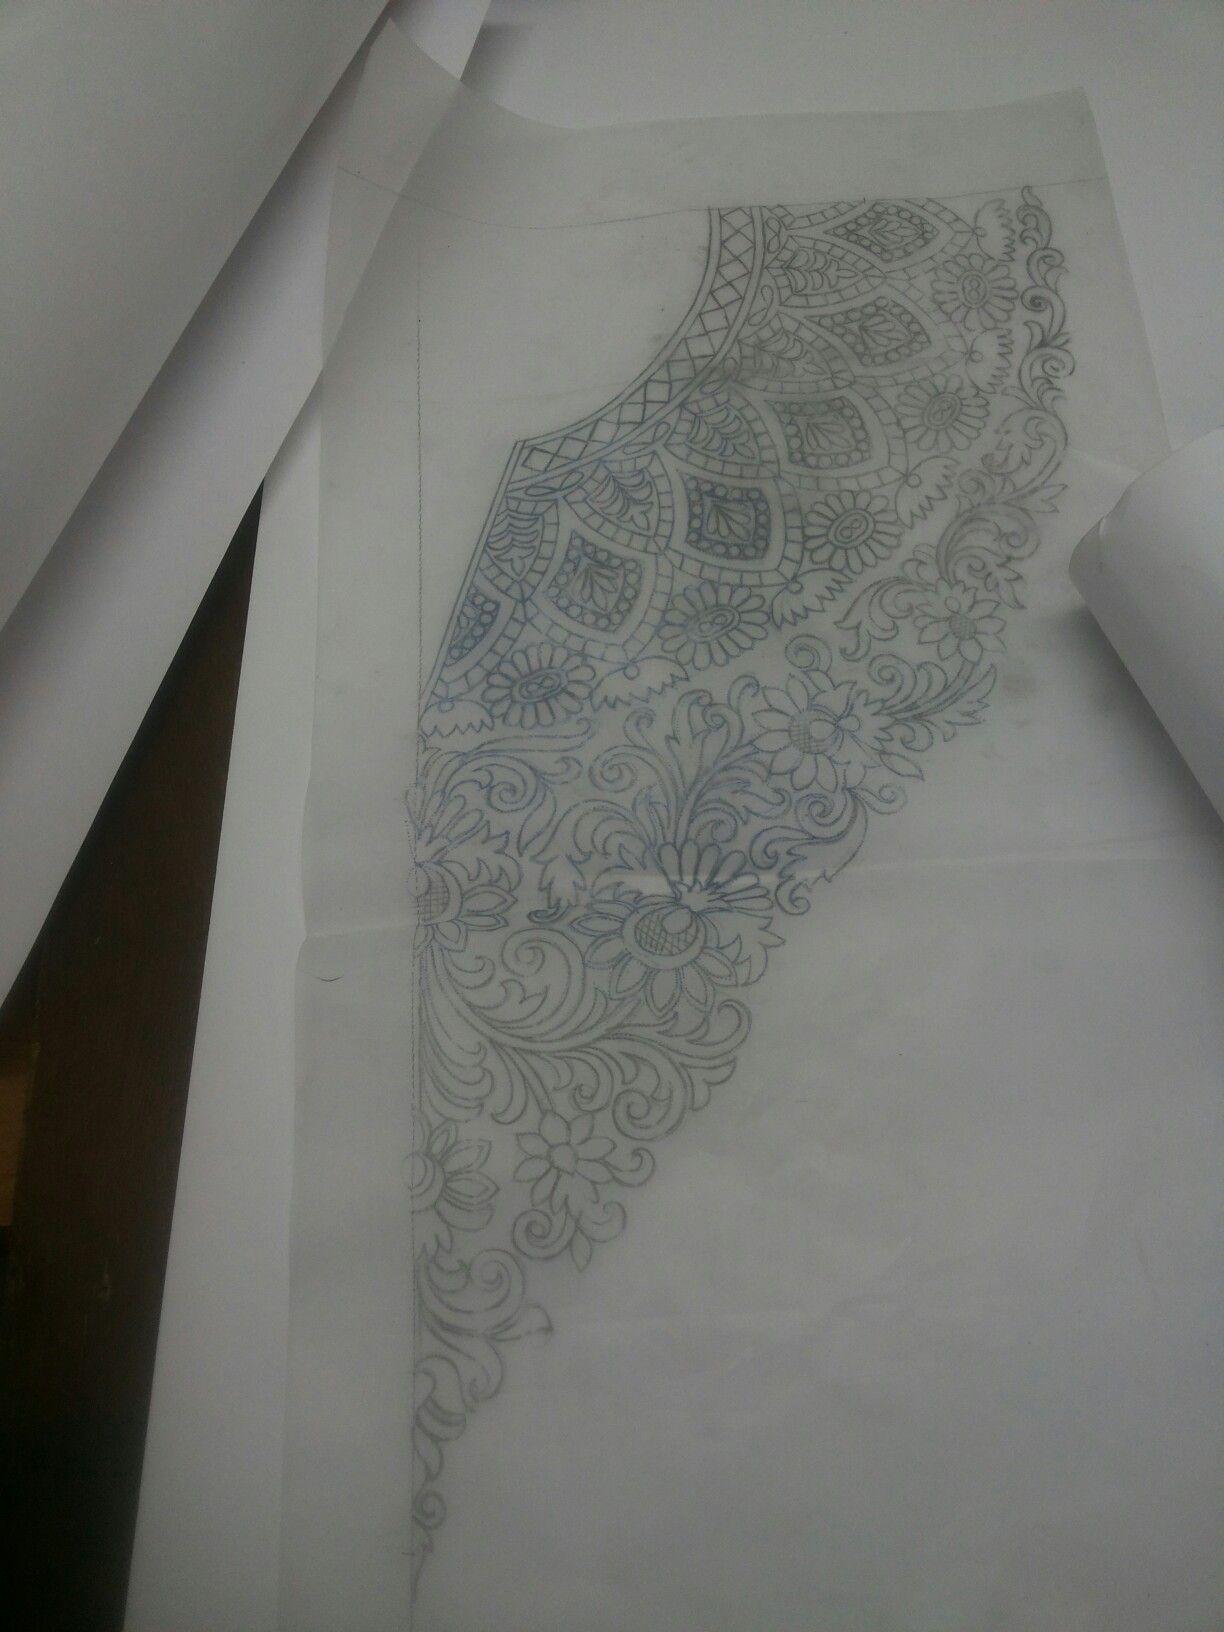 Pin by soumicha bachiri on schemas pinterest embroidery indian embroidery brazilian embroidery embroidery designs leila sherwani kurtis caftans embroidery patterns drawings bankloansurffo Gallery